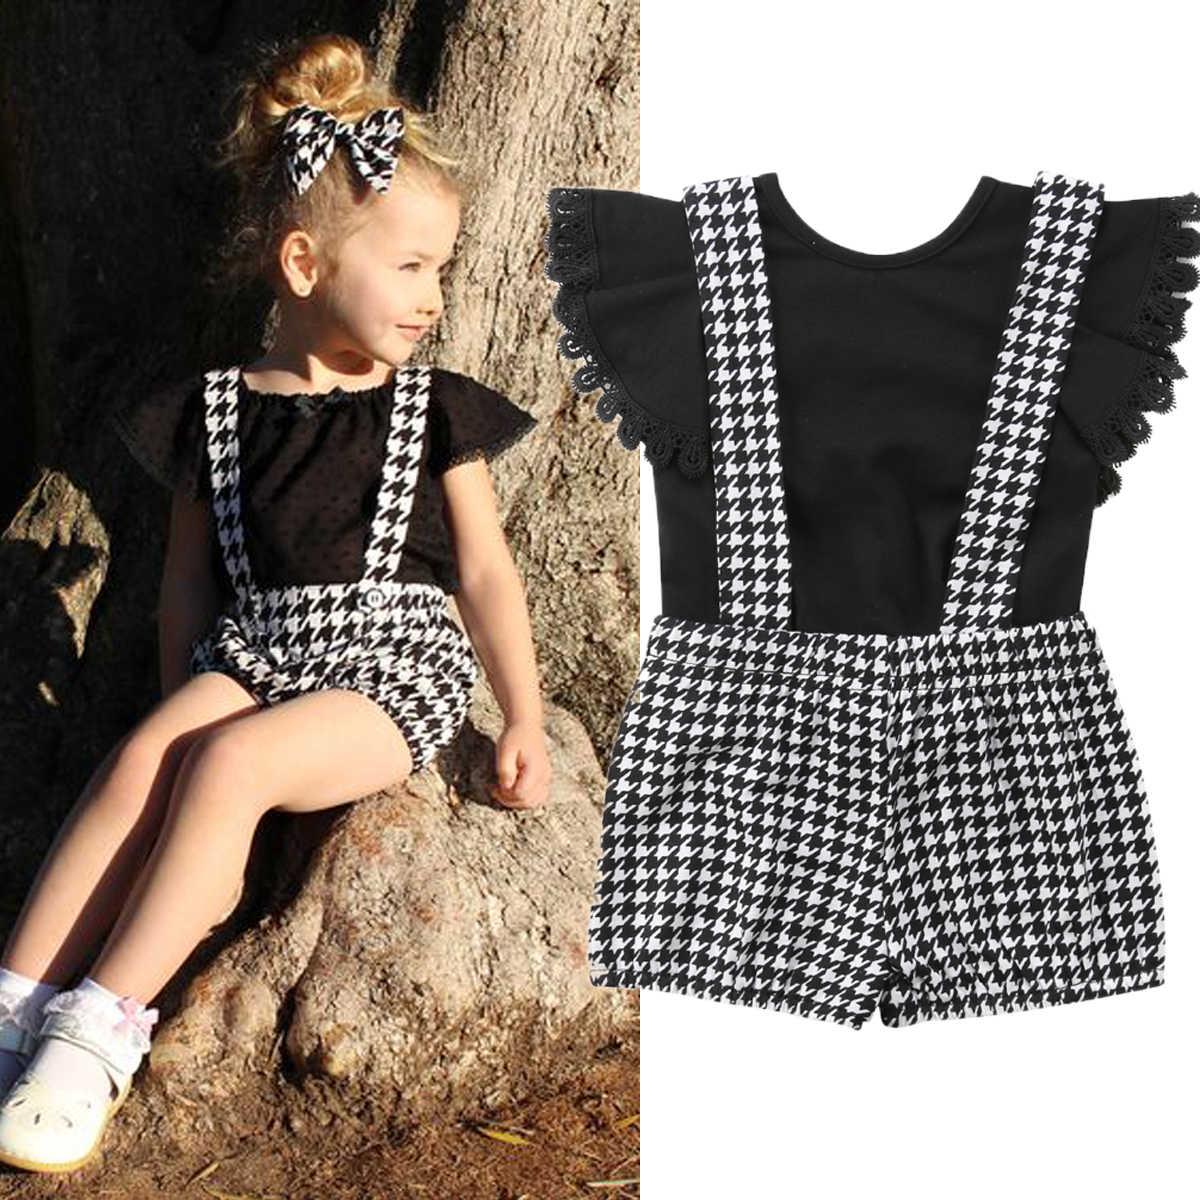 9c2387998e46 2019 Fashion Toddler Kid Baby Clothes Summer Lace Short Sleeve T Shirt Plaid  Bib Pants 2Pcs